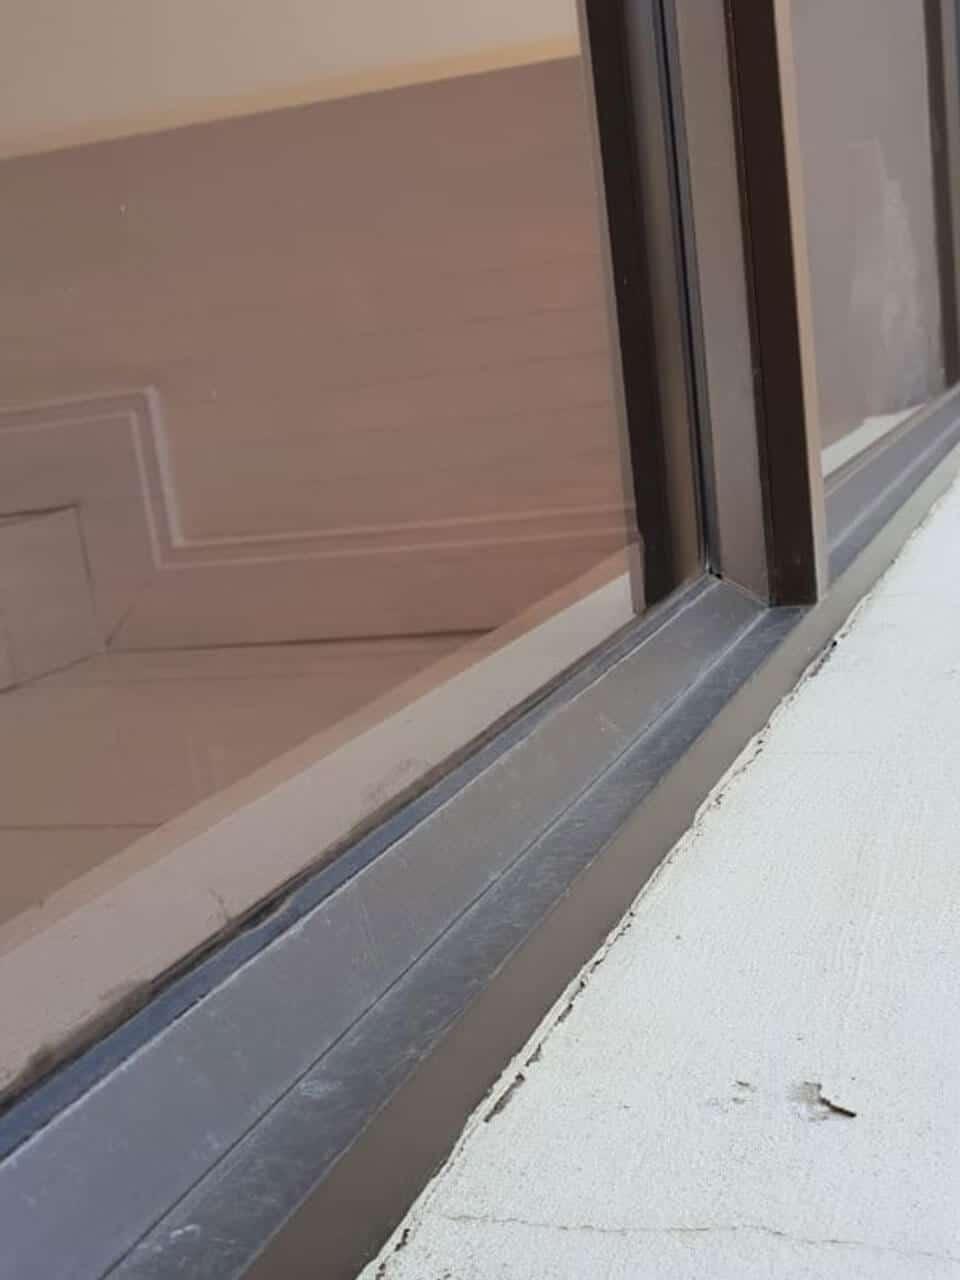 Cementitious-waterproofing-window-frames-before